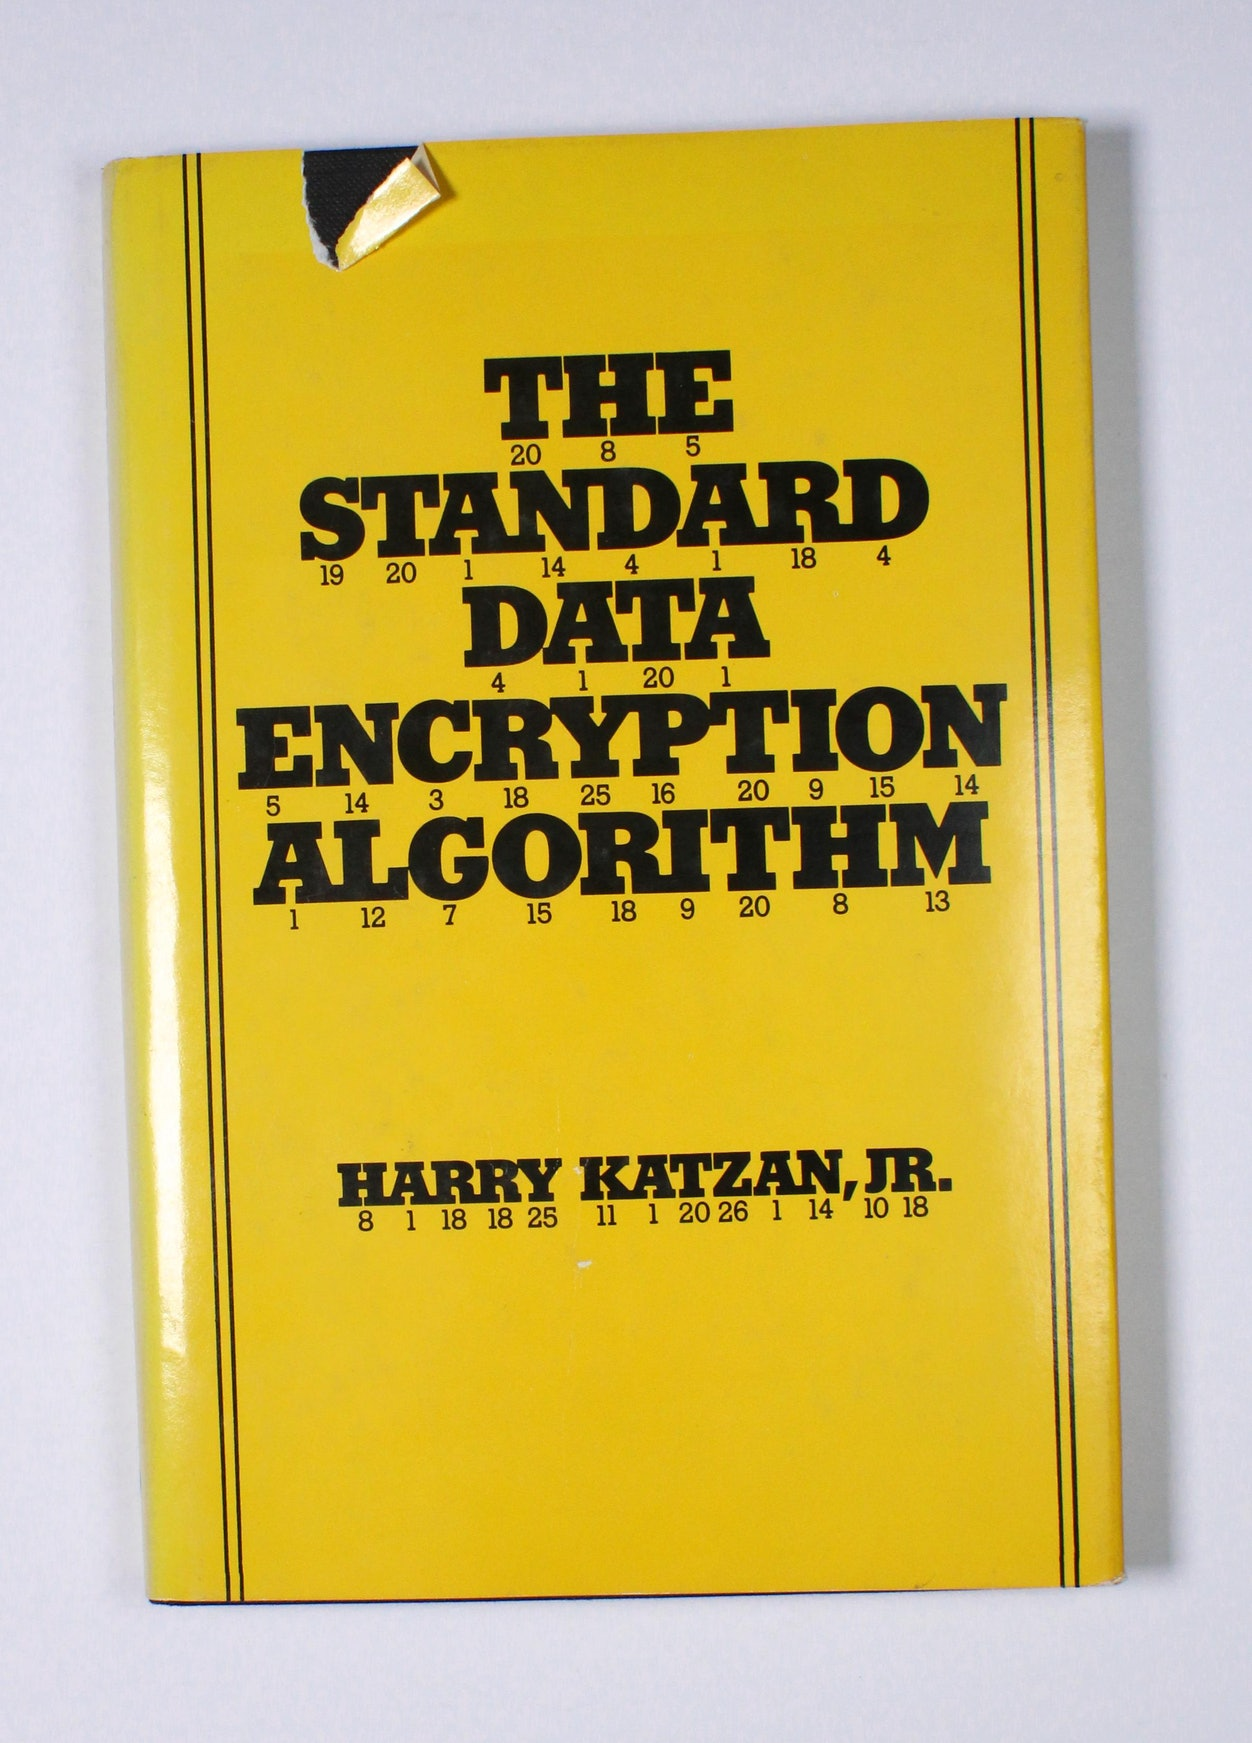 The Standard Data Encryption Algorithm